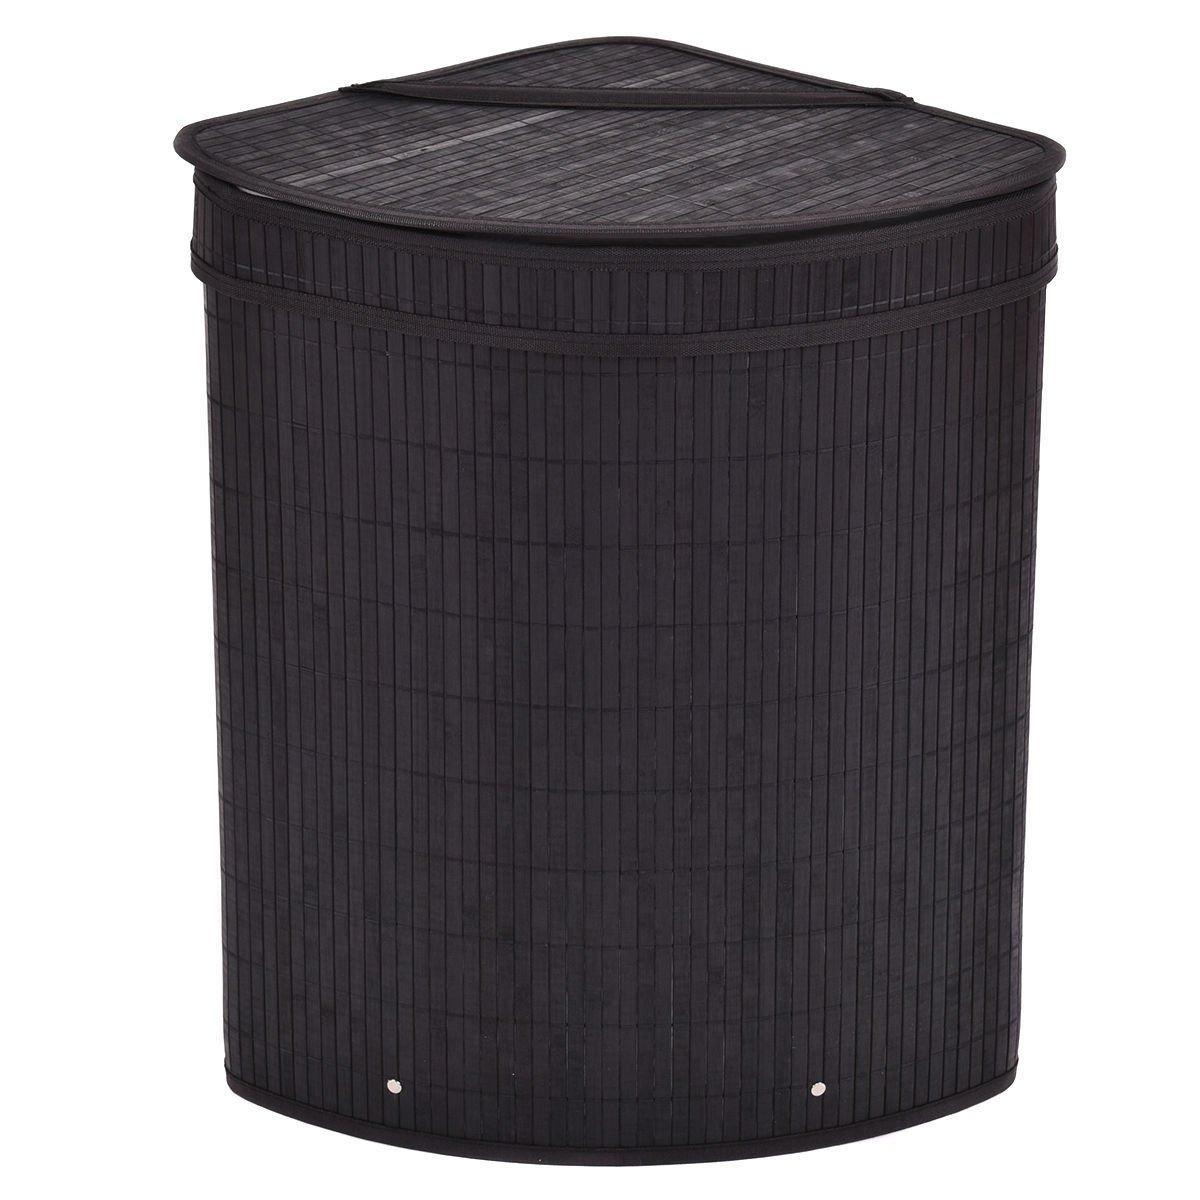 Bamboo Hamper Triangle Laundry Basket Washing Cloth Storage Bin Bag With Lid